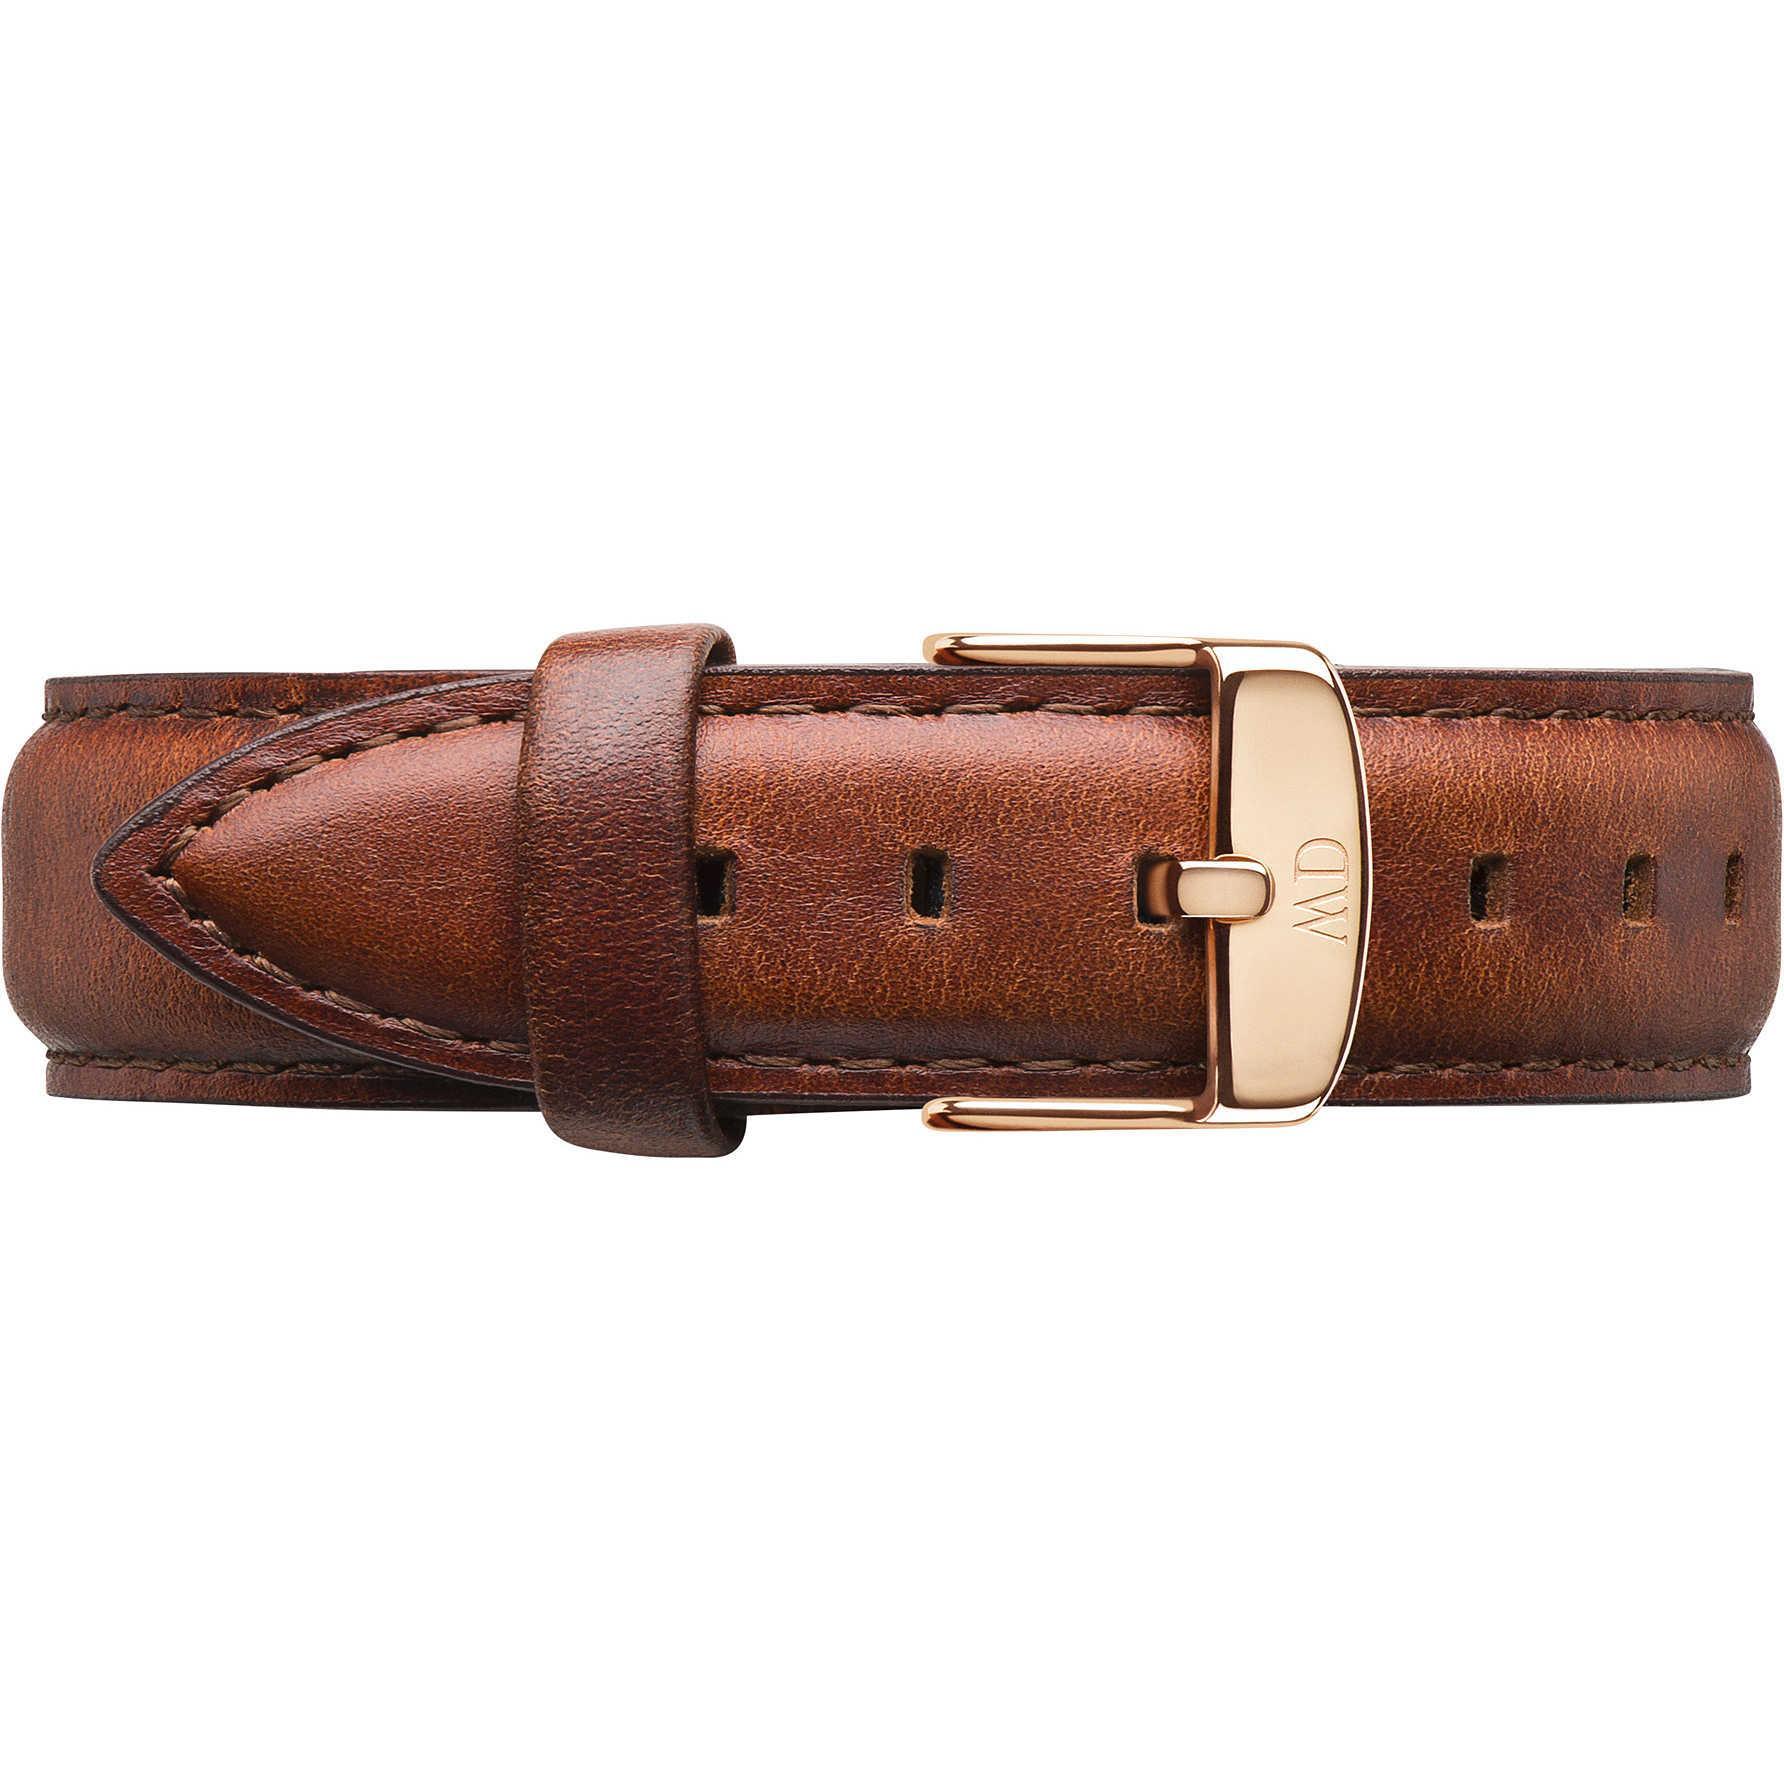 Cinturino Classic Petite St Mawes Pelle Marrone Donna Oro Rosa 14mm DW00200145 - DANIEL WELLINGTON